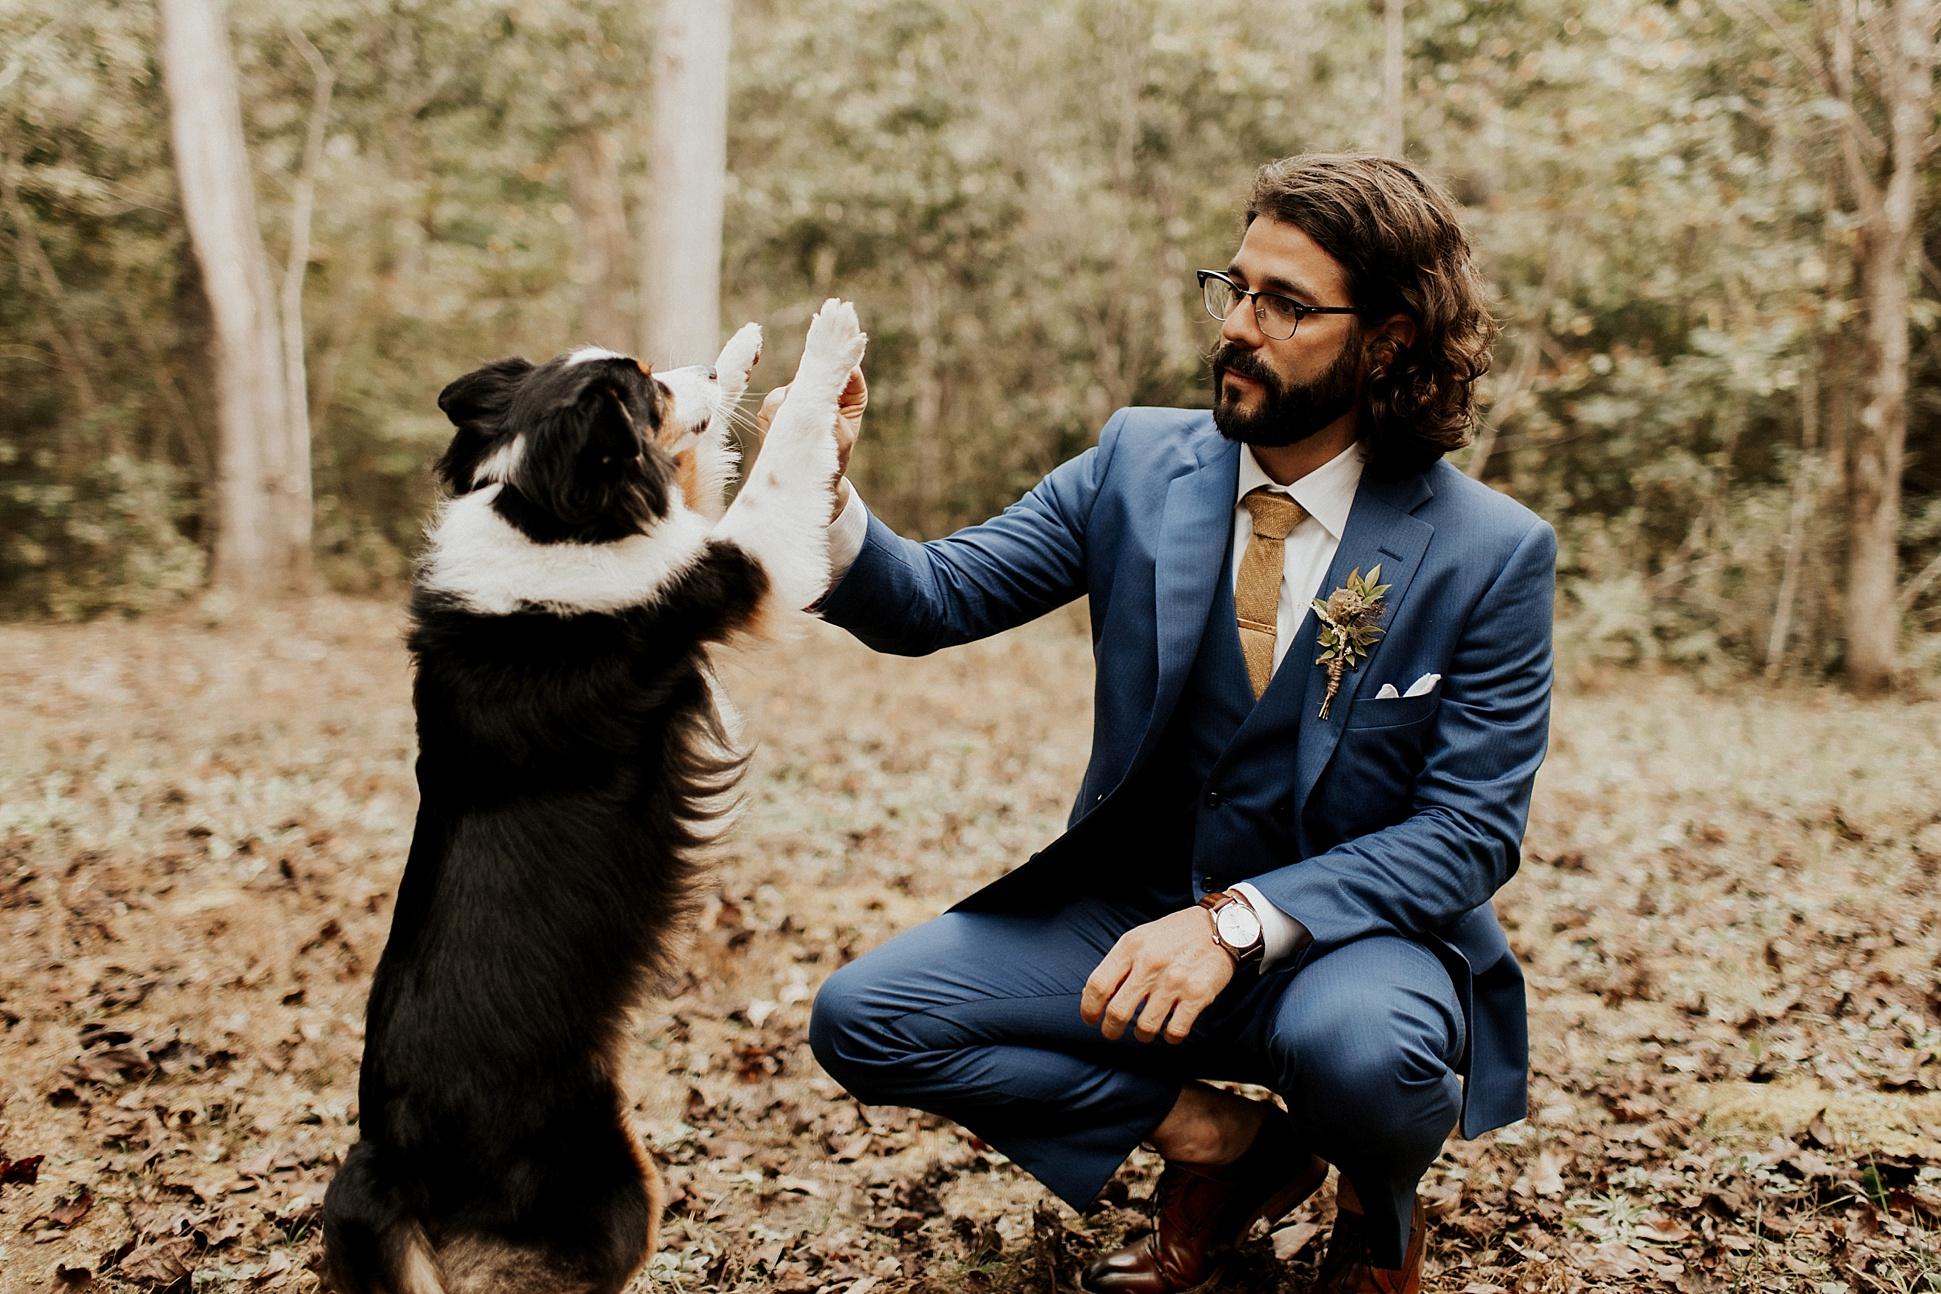 sugarboo_farms_intimate_mountain_wedding004.JPG